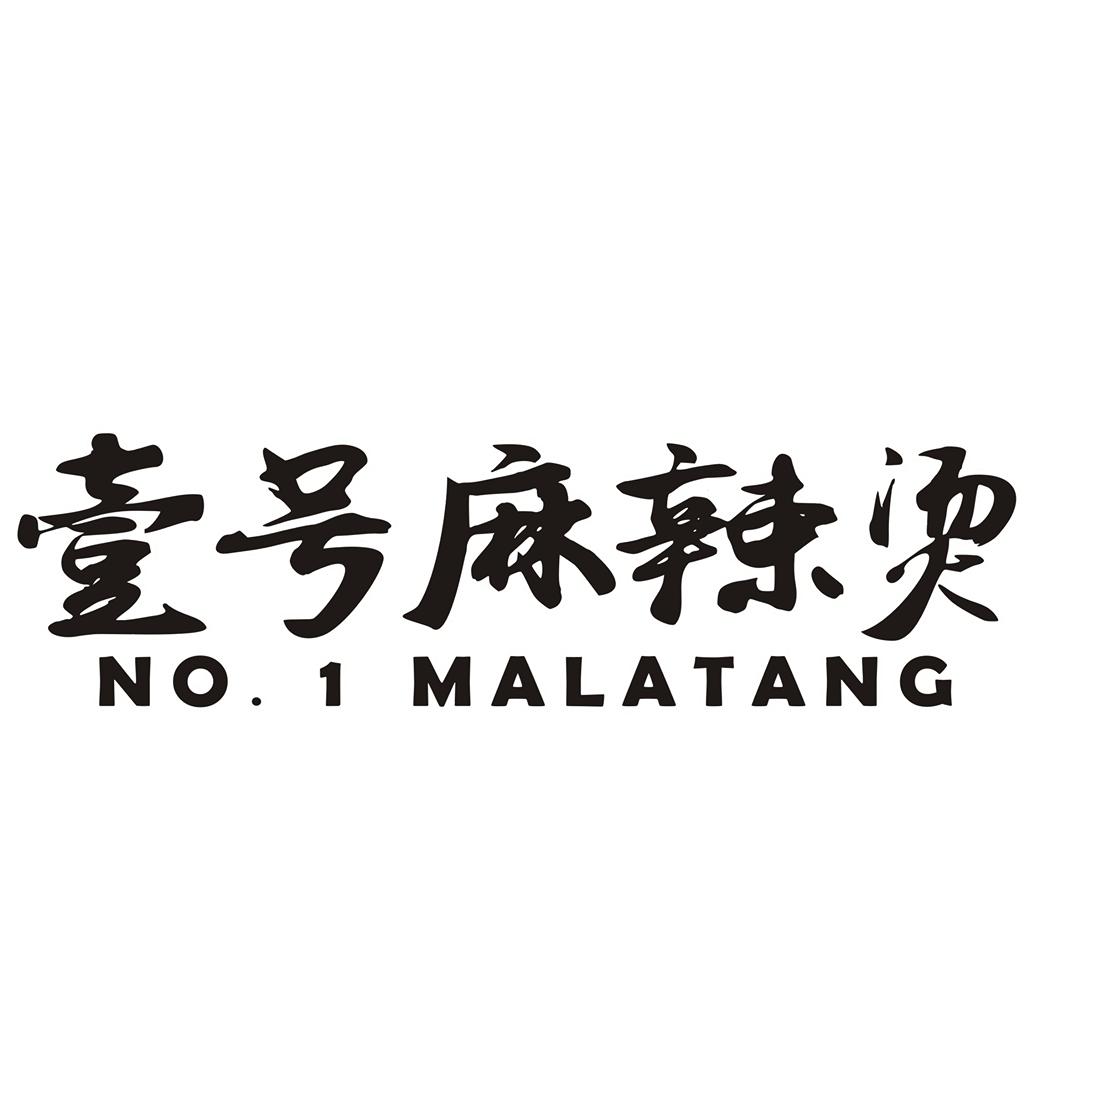 No.1 Malatown logo